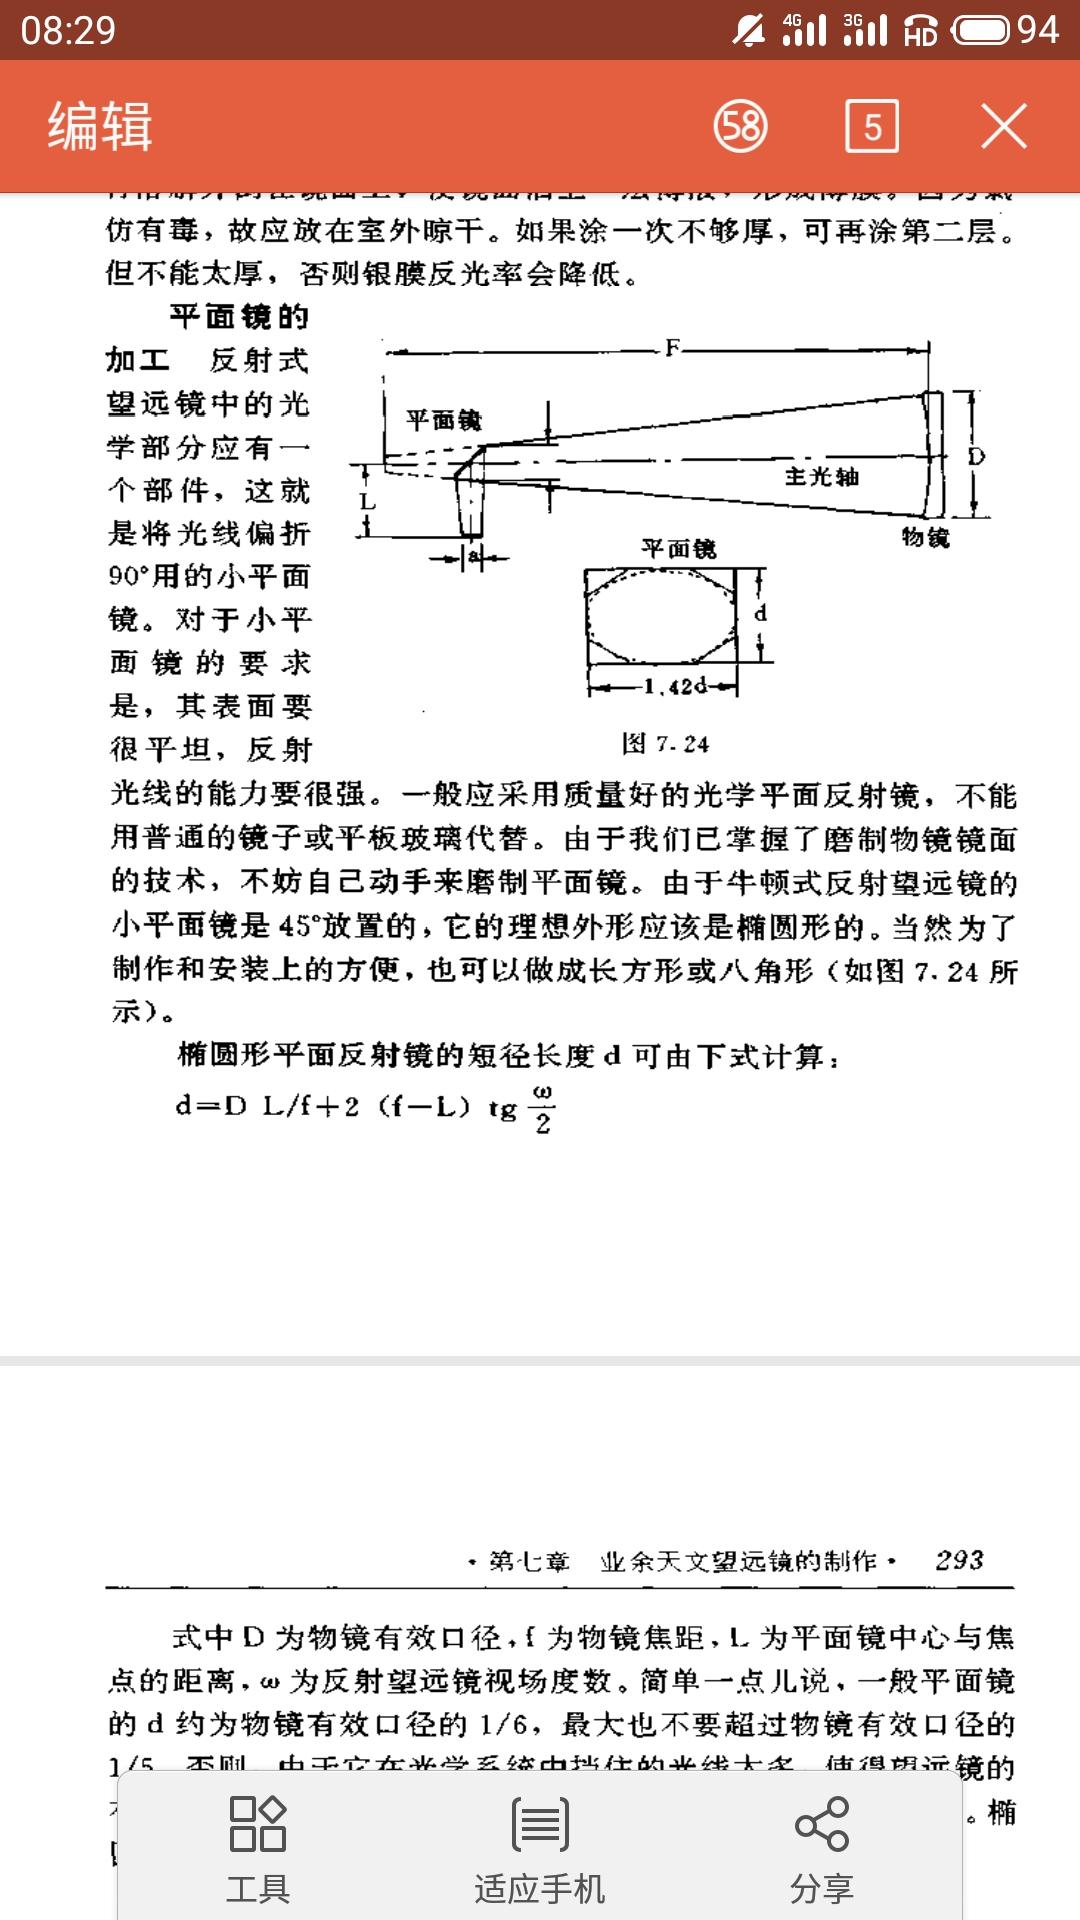 S91129-08291358.jpg